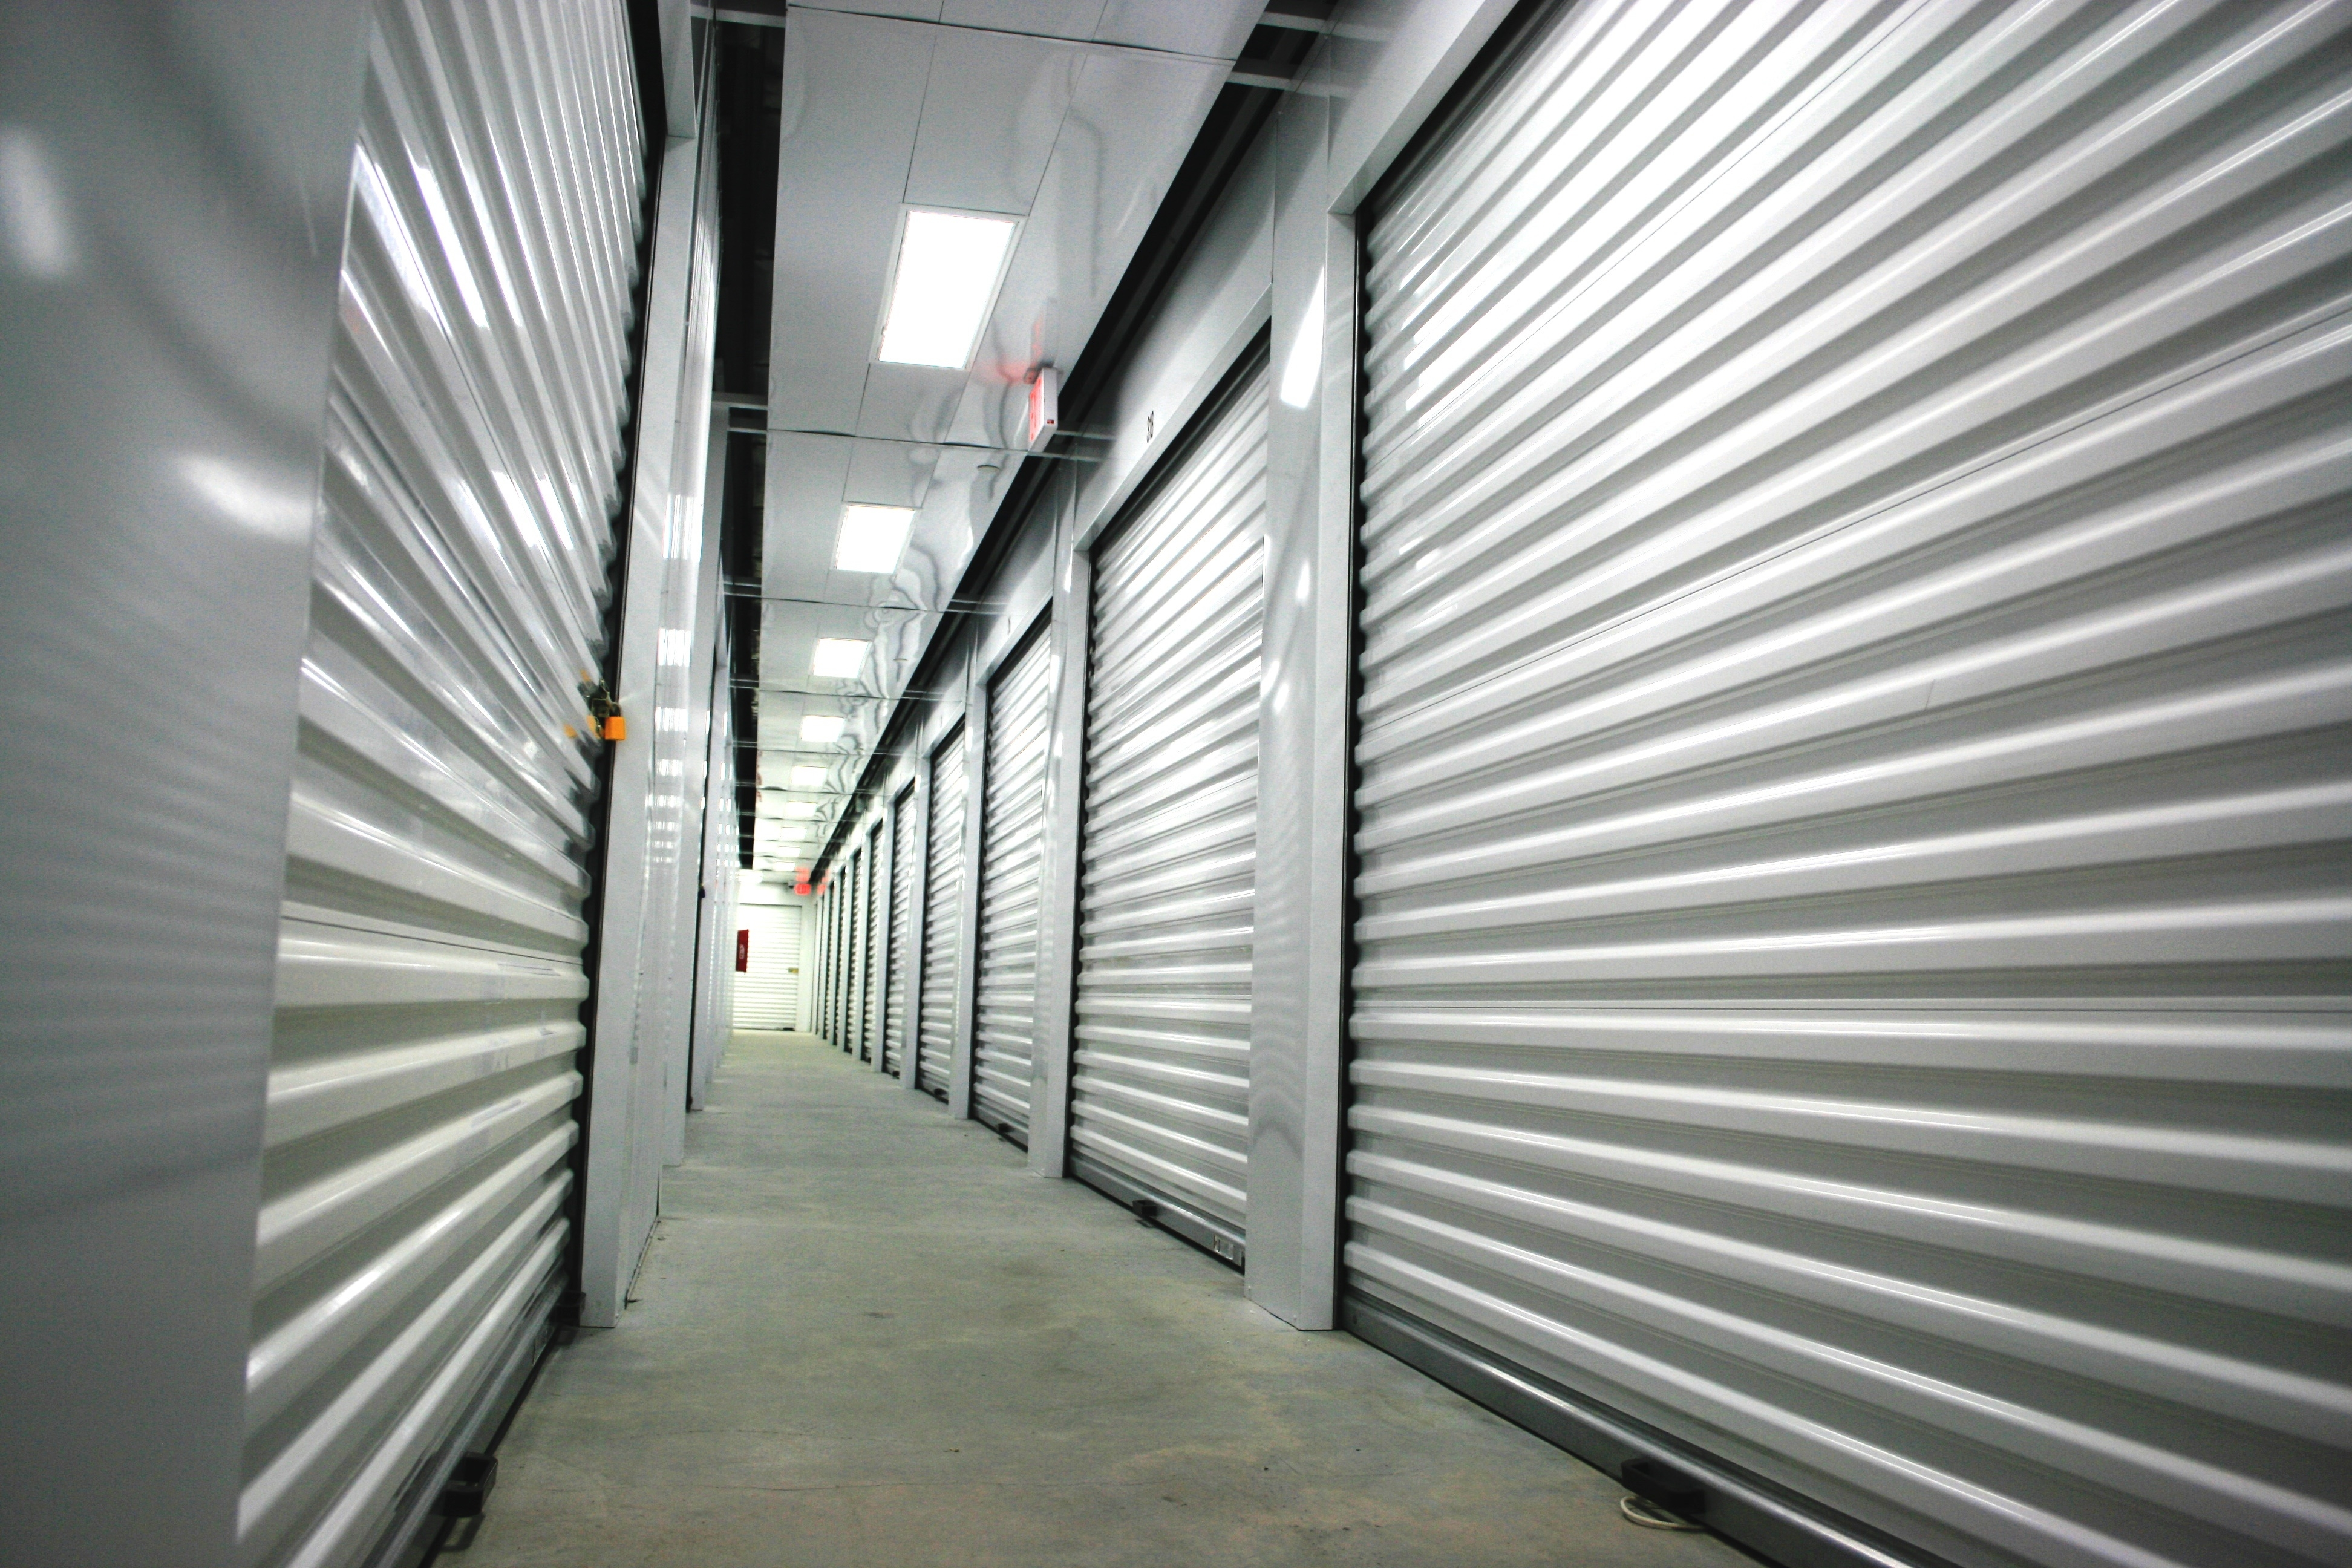 Cedar ridge south 75 storage in tulsa ok warehouses for Cedar ridge storage